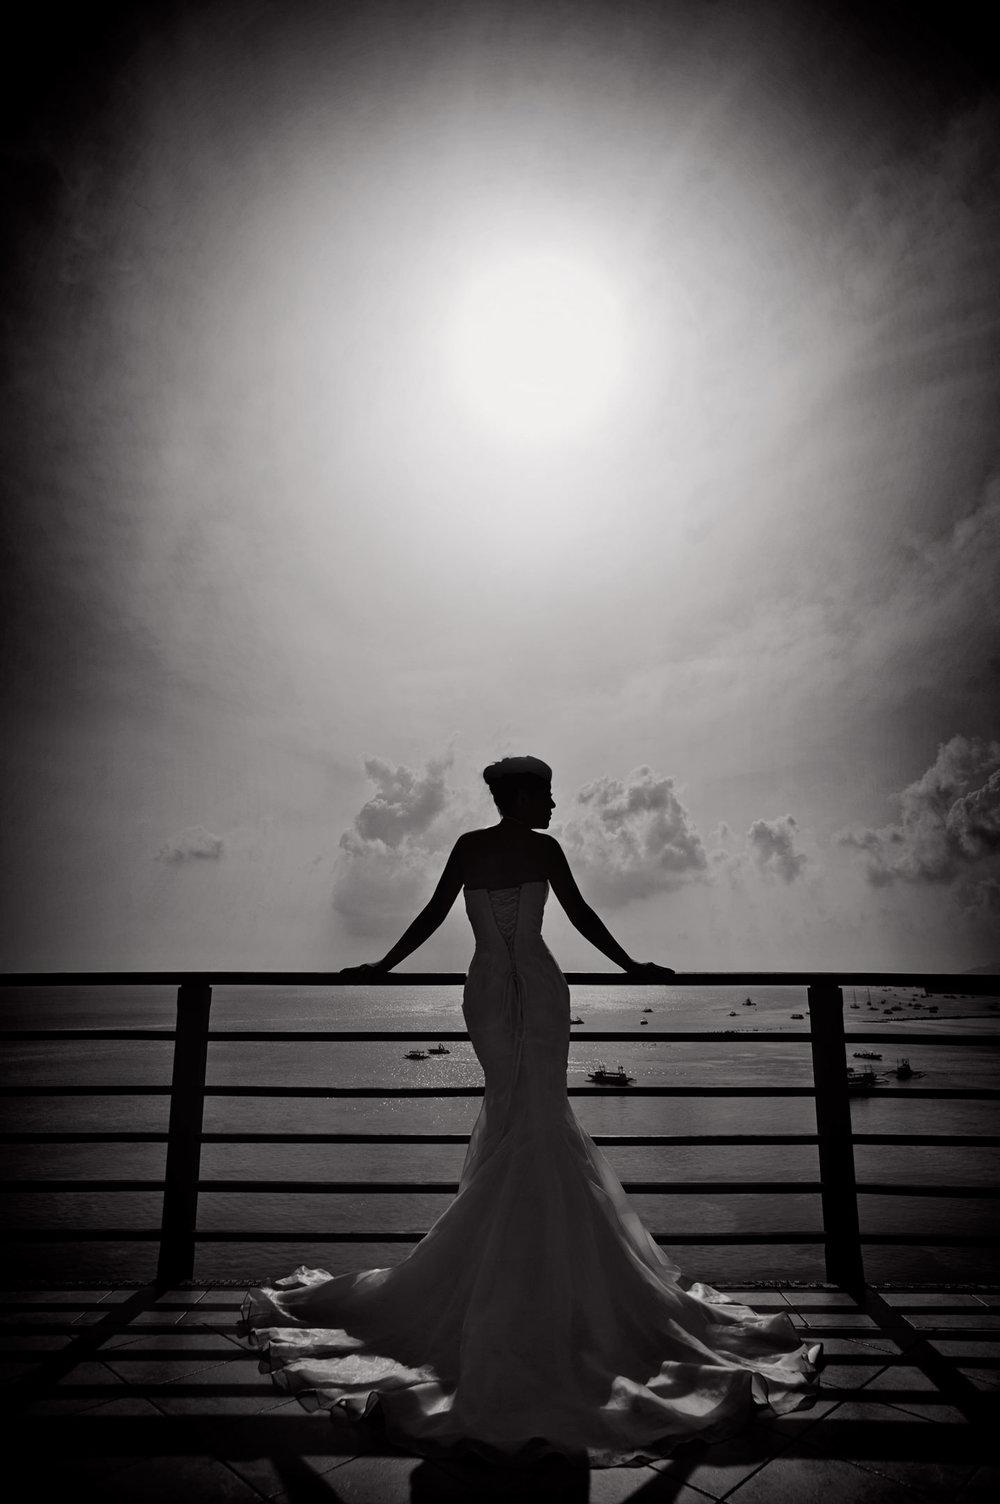 Chris_Hui_婚禮_婚紗照_pre_wedding_photography_best_072_.jpg